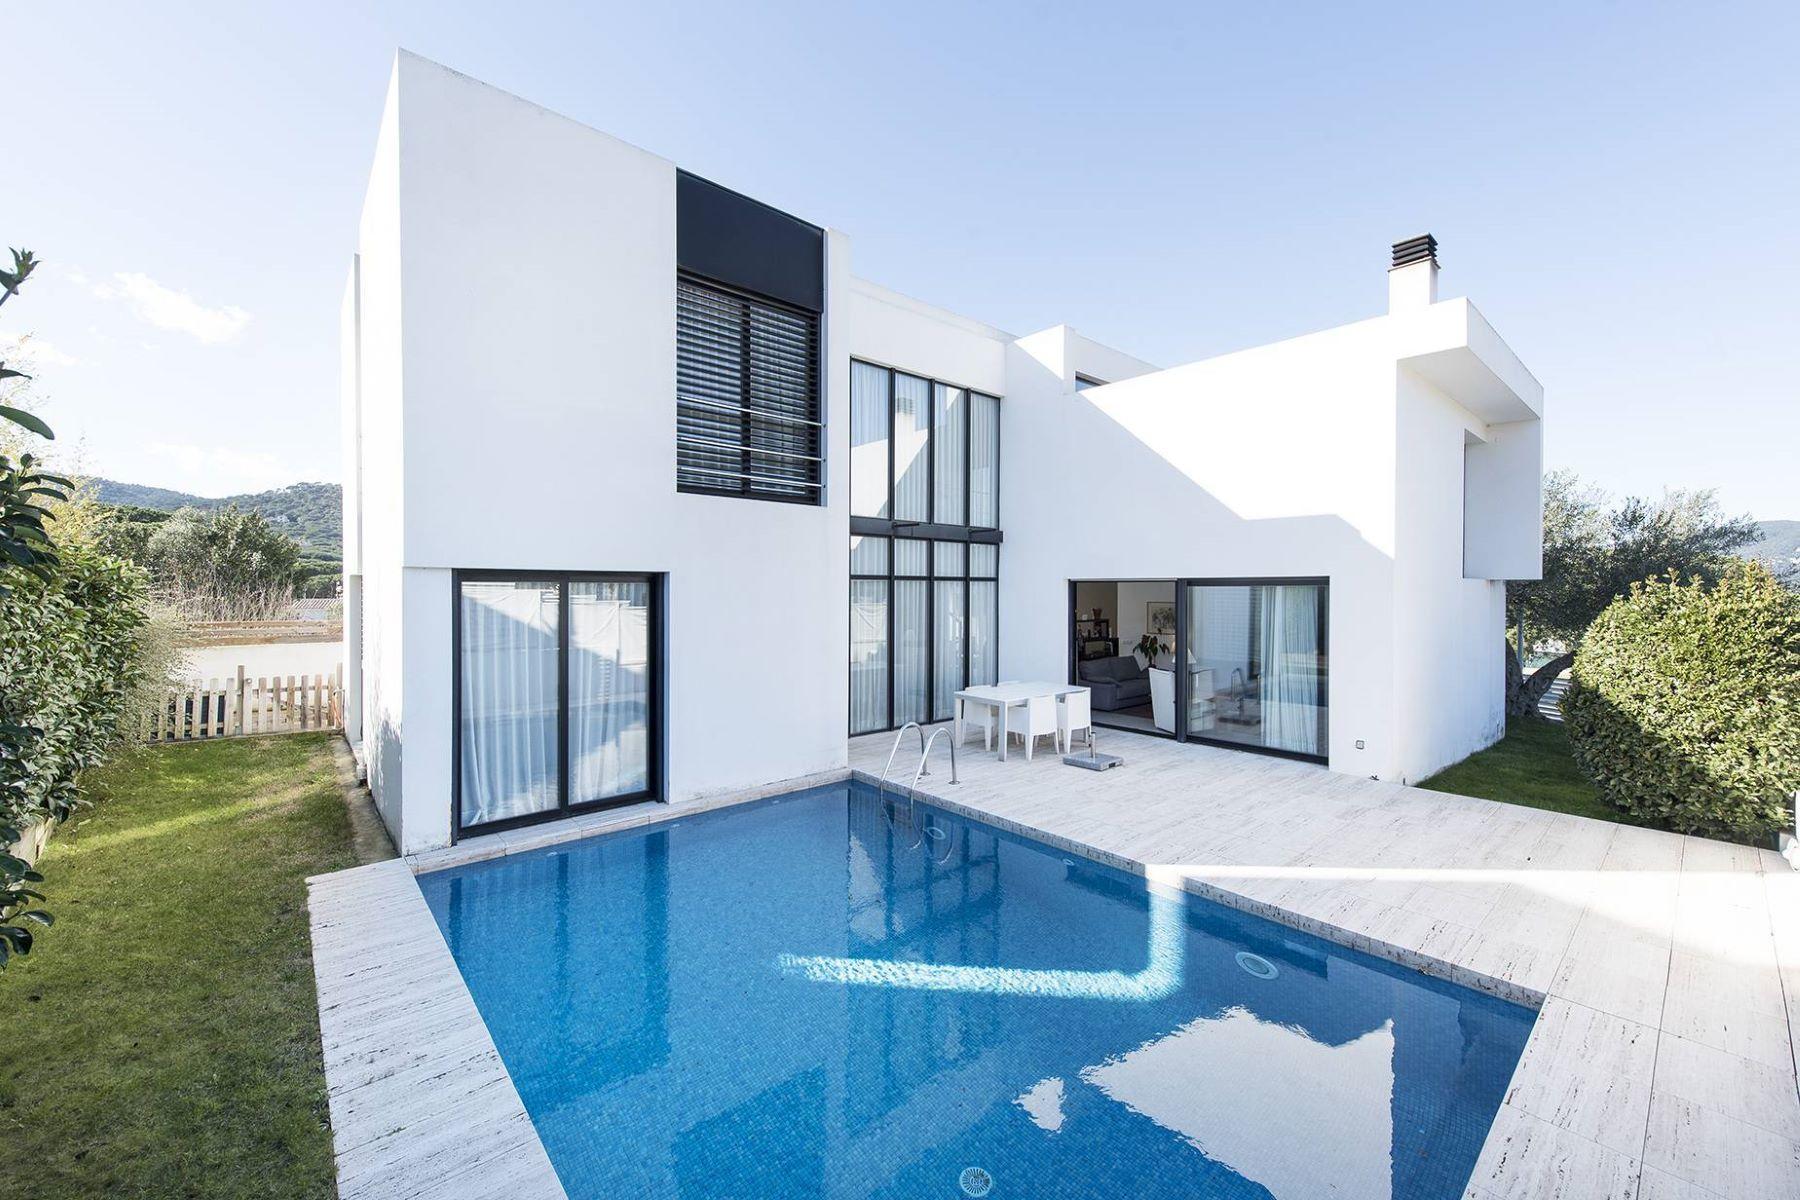 Tek Ailelik Ev için Satış at Splendid designer villa in a quiet estate of Sant Feliu de Guíxols Sant Feliu De Guixols, Costa Brava, 17220 Ispanya